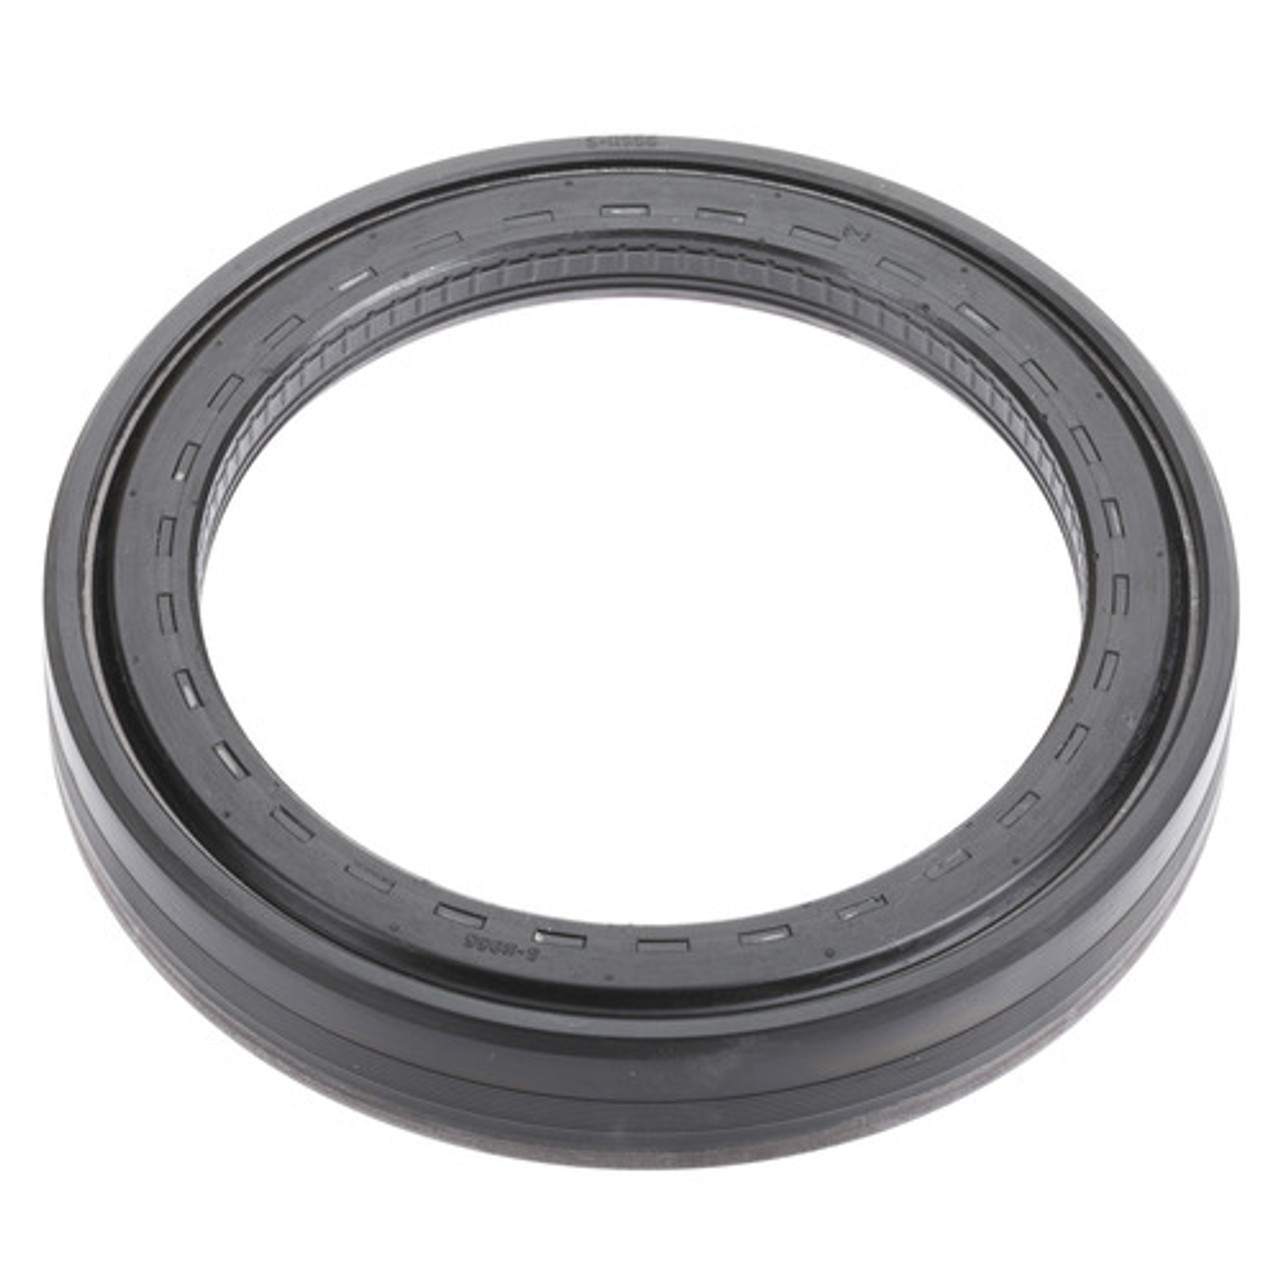 Wheel Seal- Teflon Coated- 5.911 OD 4.375 ID